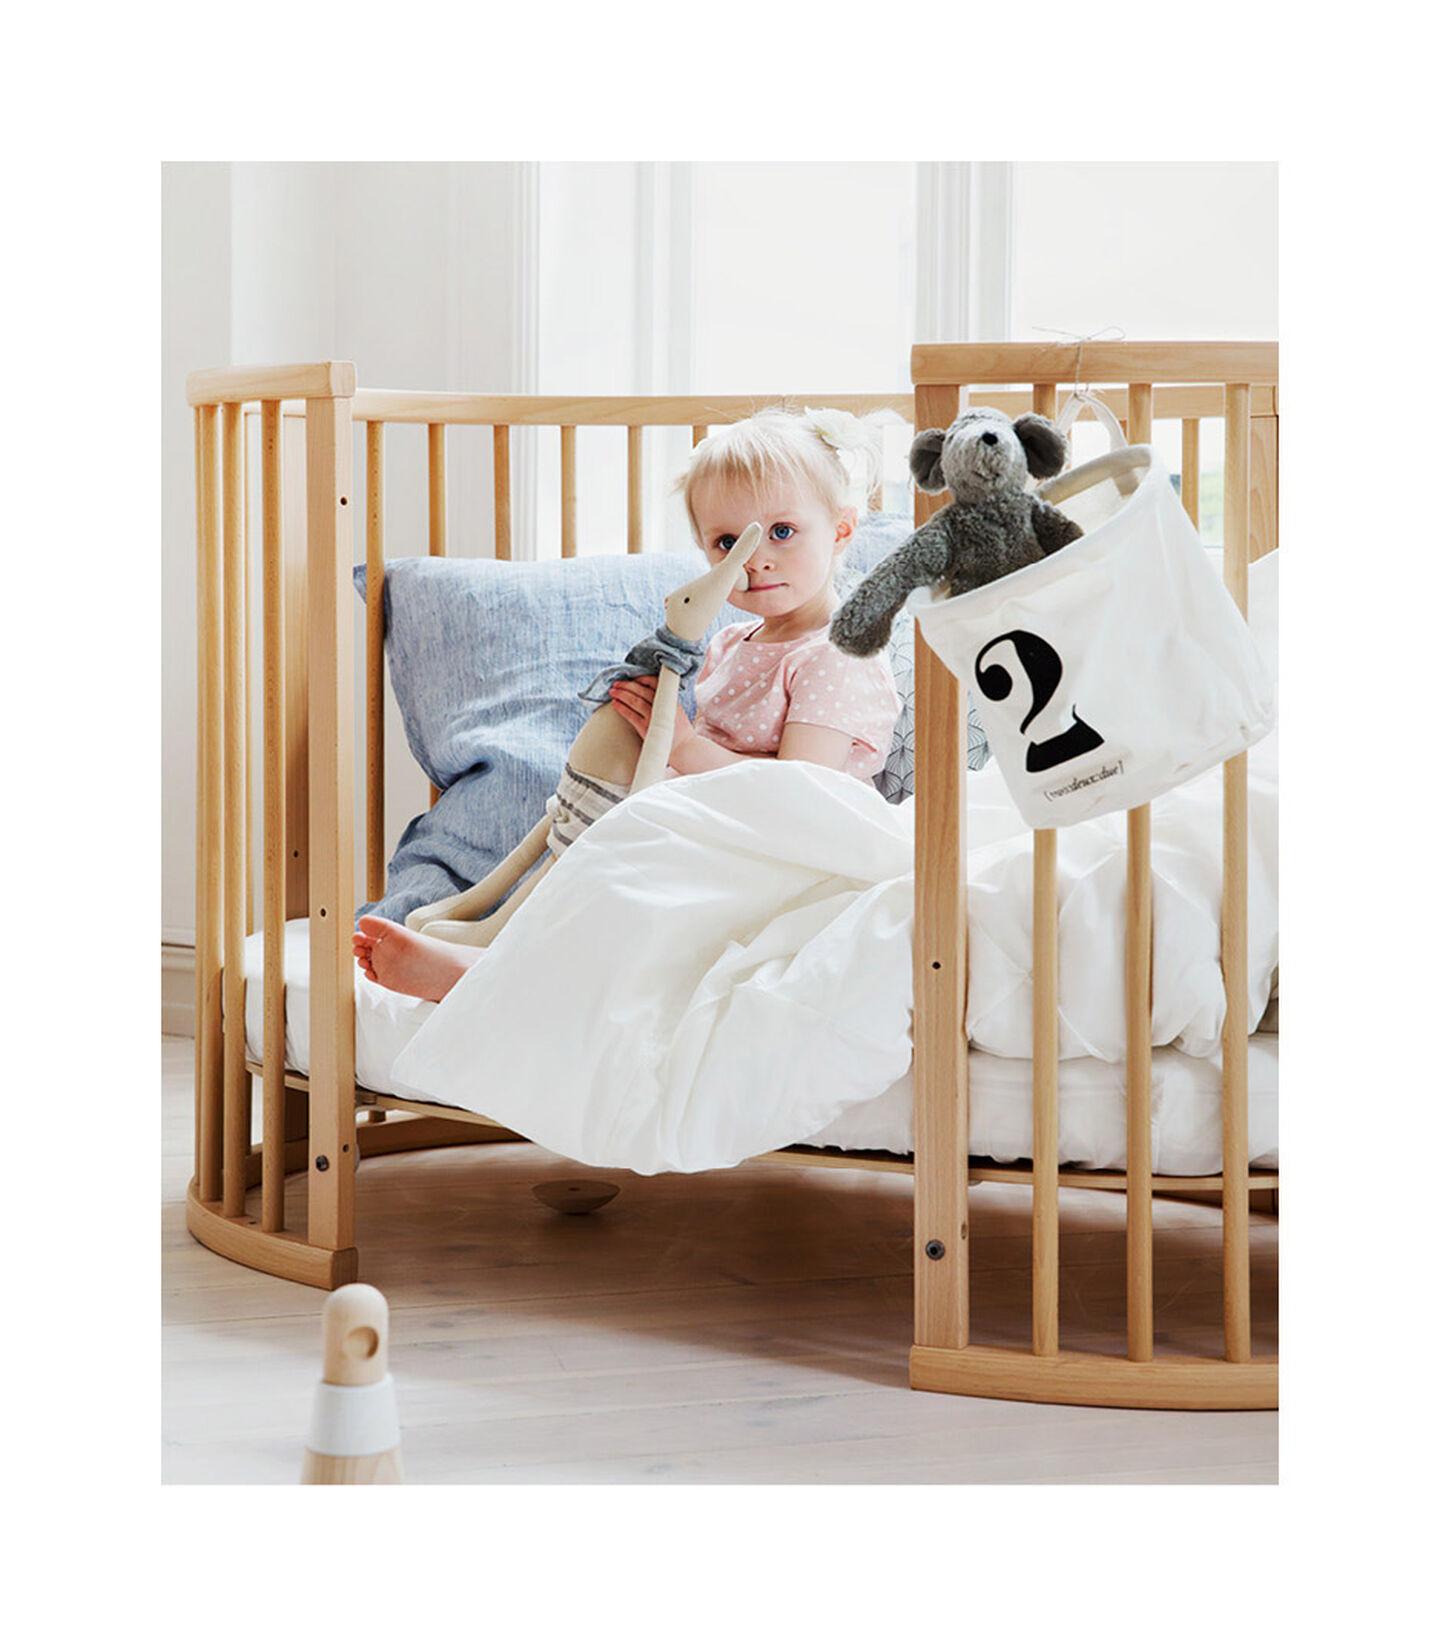 Stokke® Sleepi™ Bed Uitbreidingset Natural, Natural, mainview view 2